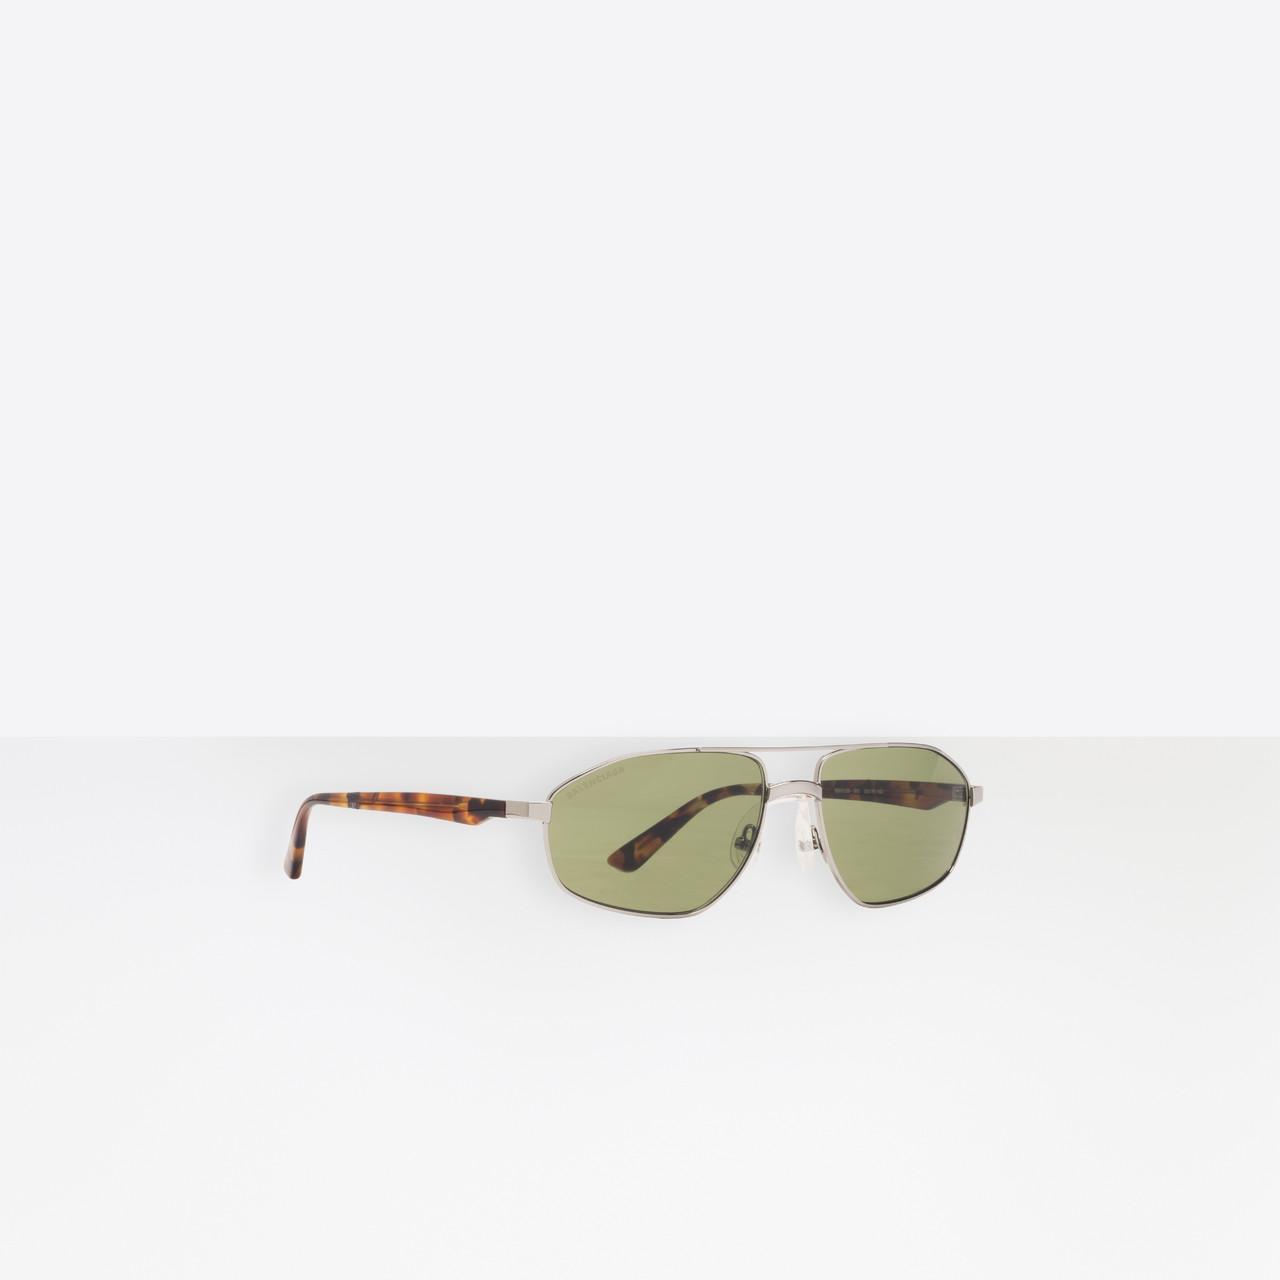 313734f03f Gafas de sol Vintage Aviator Balenciaga de hombre - Lyst